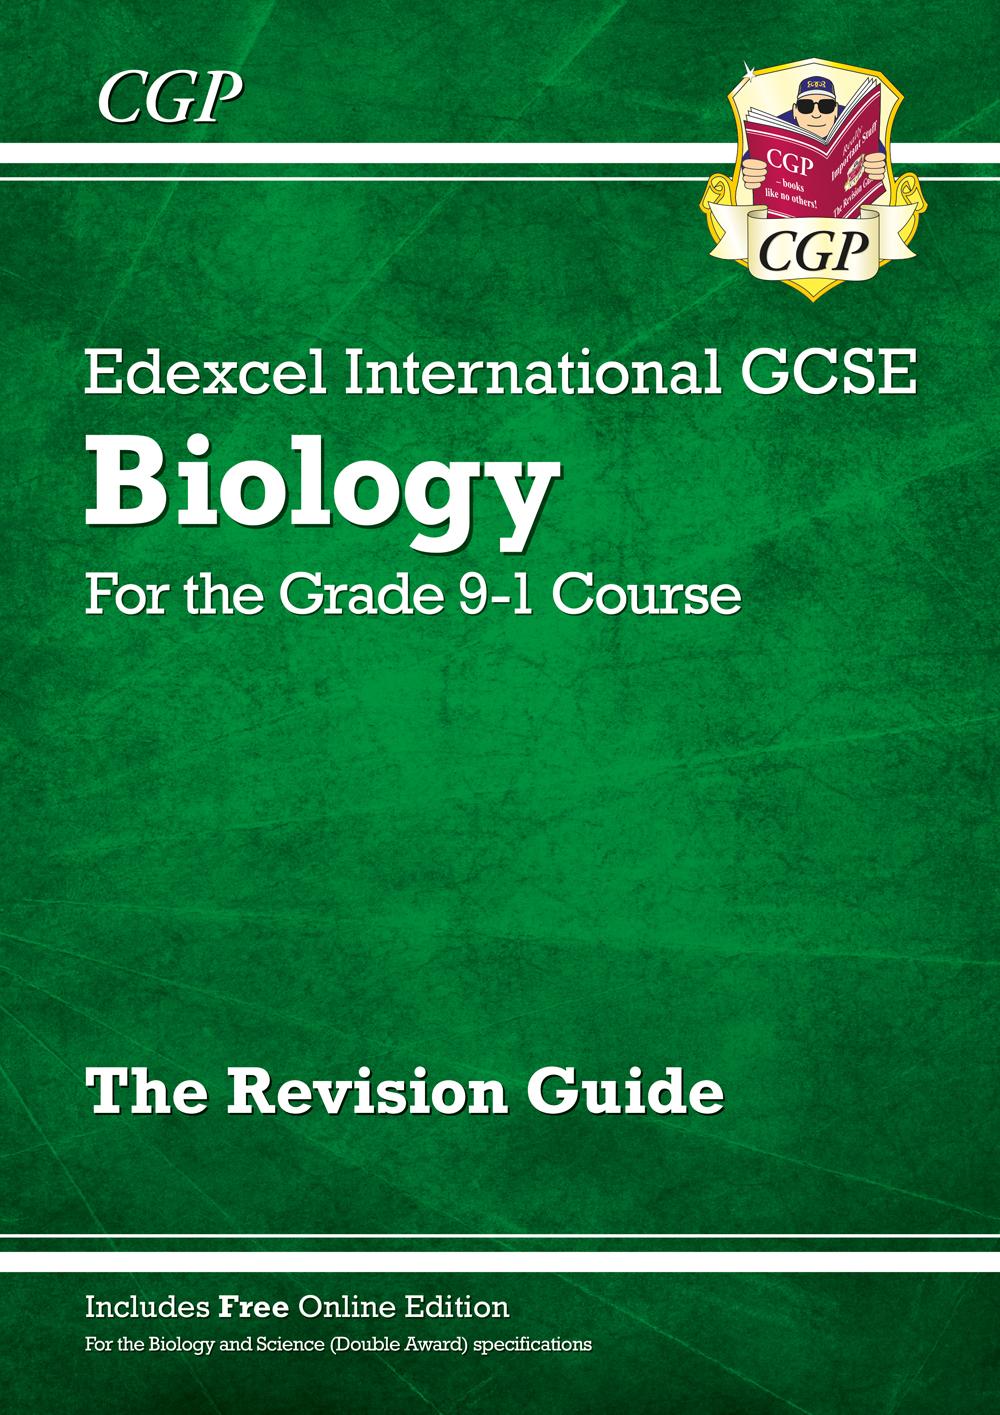 Edexcel Igcse Physics Revision Guide Pdf